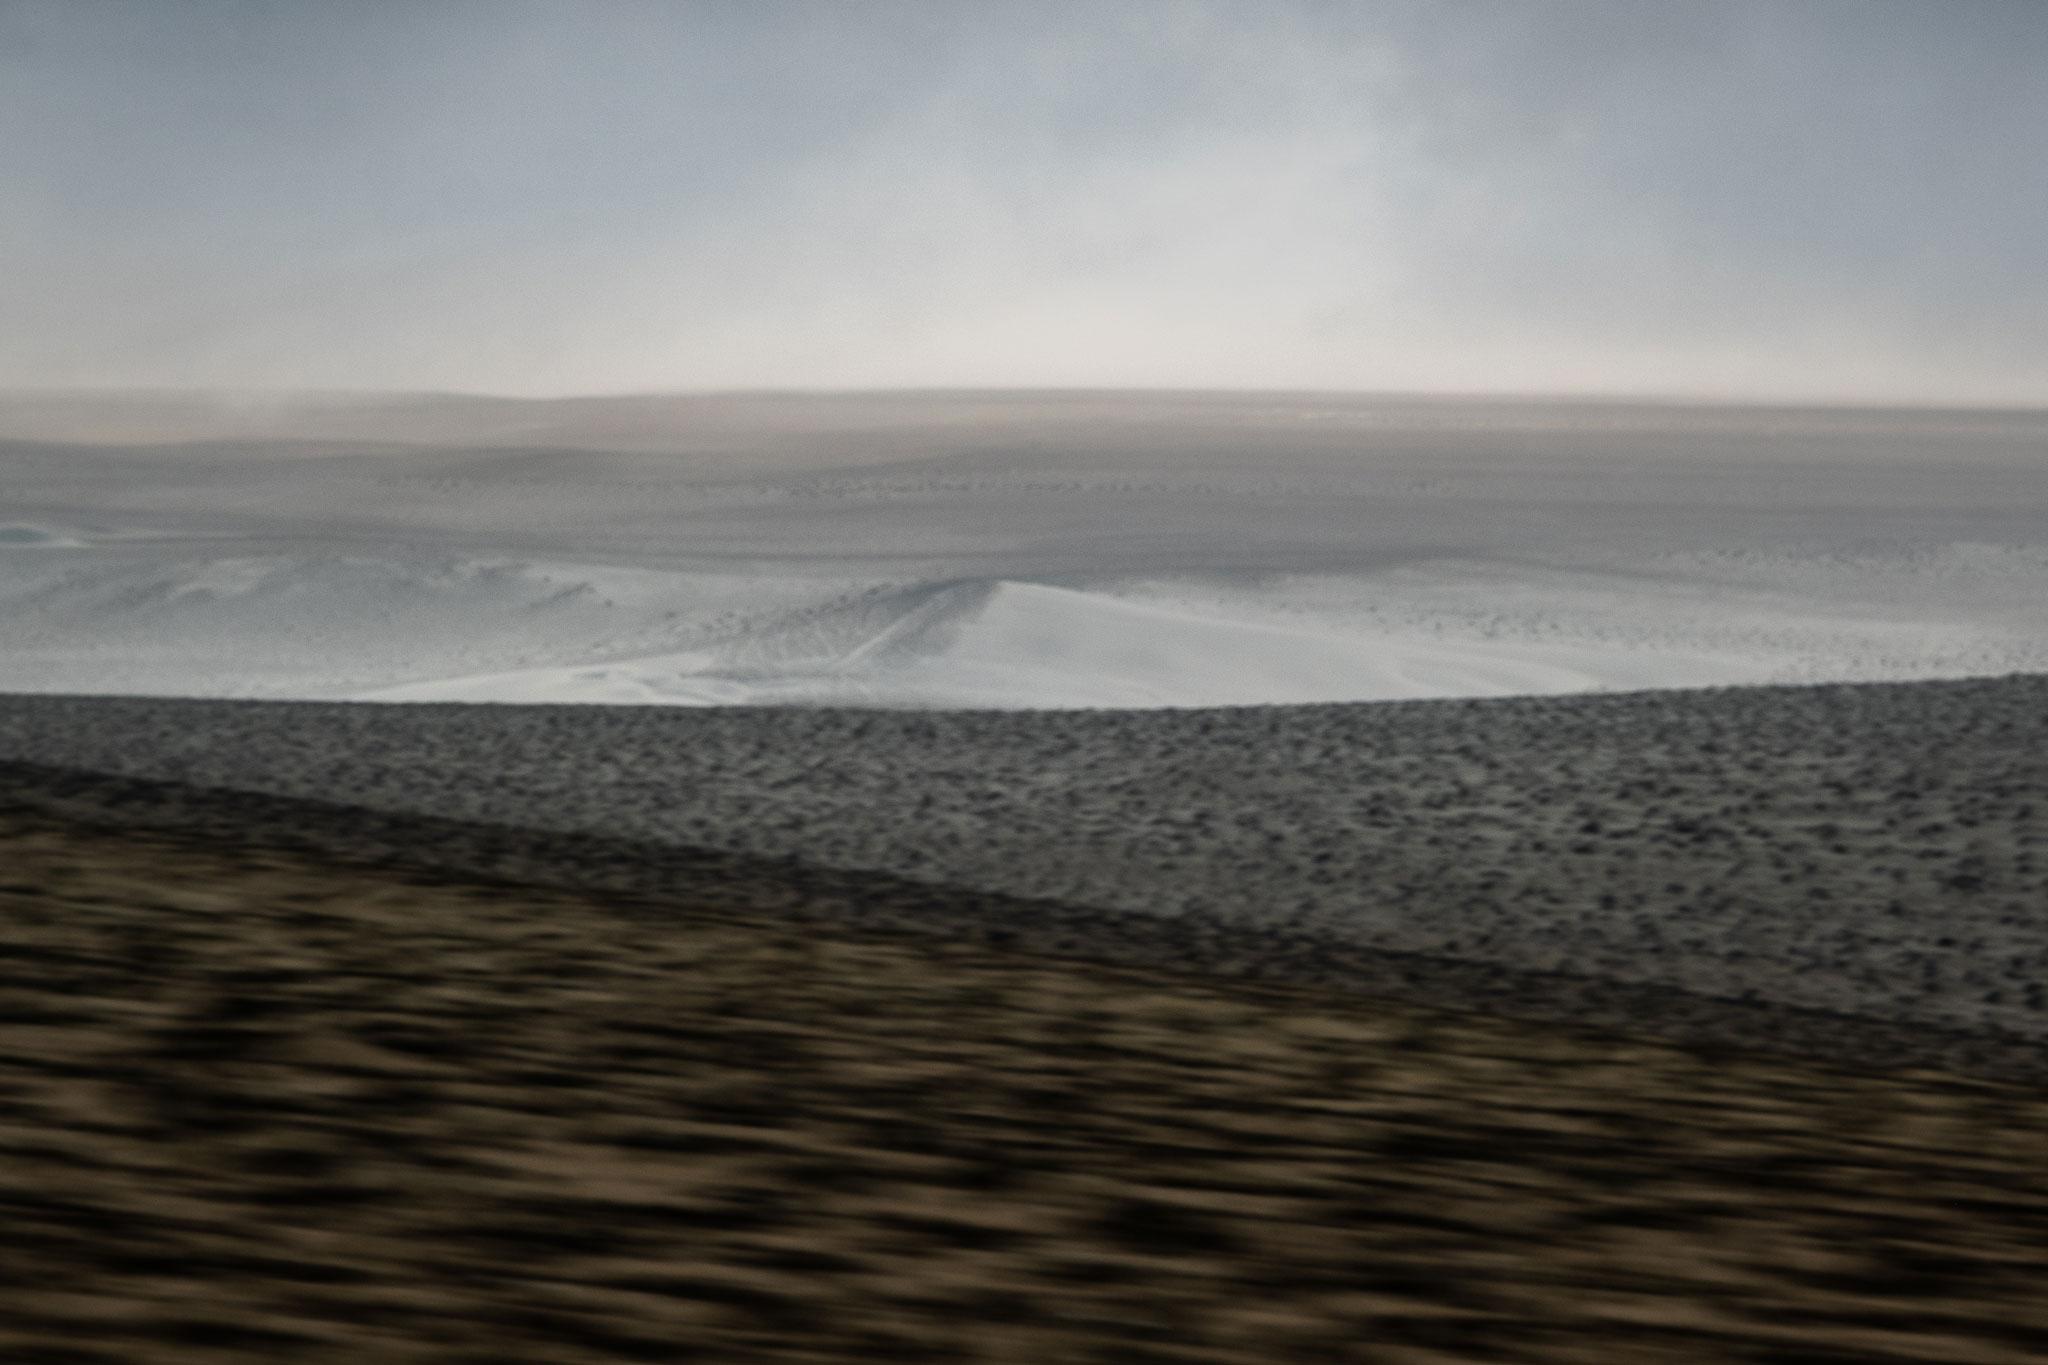 abstract-landscape-panamericana-peru